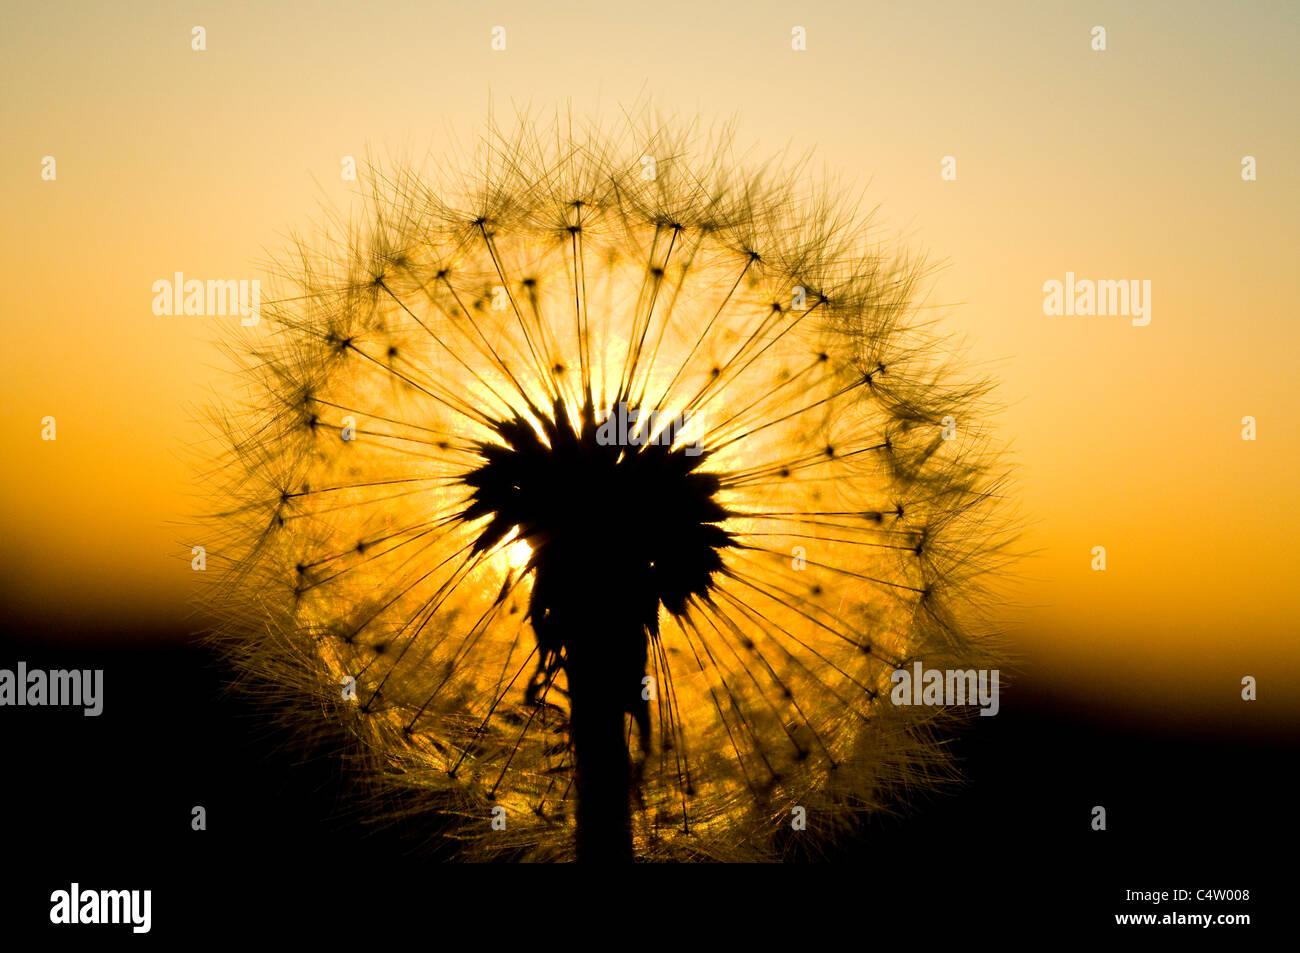 Dandelion seedhead (Taraxacum officinale) at sunset - Stock Image